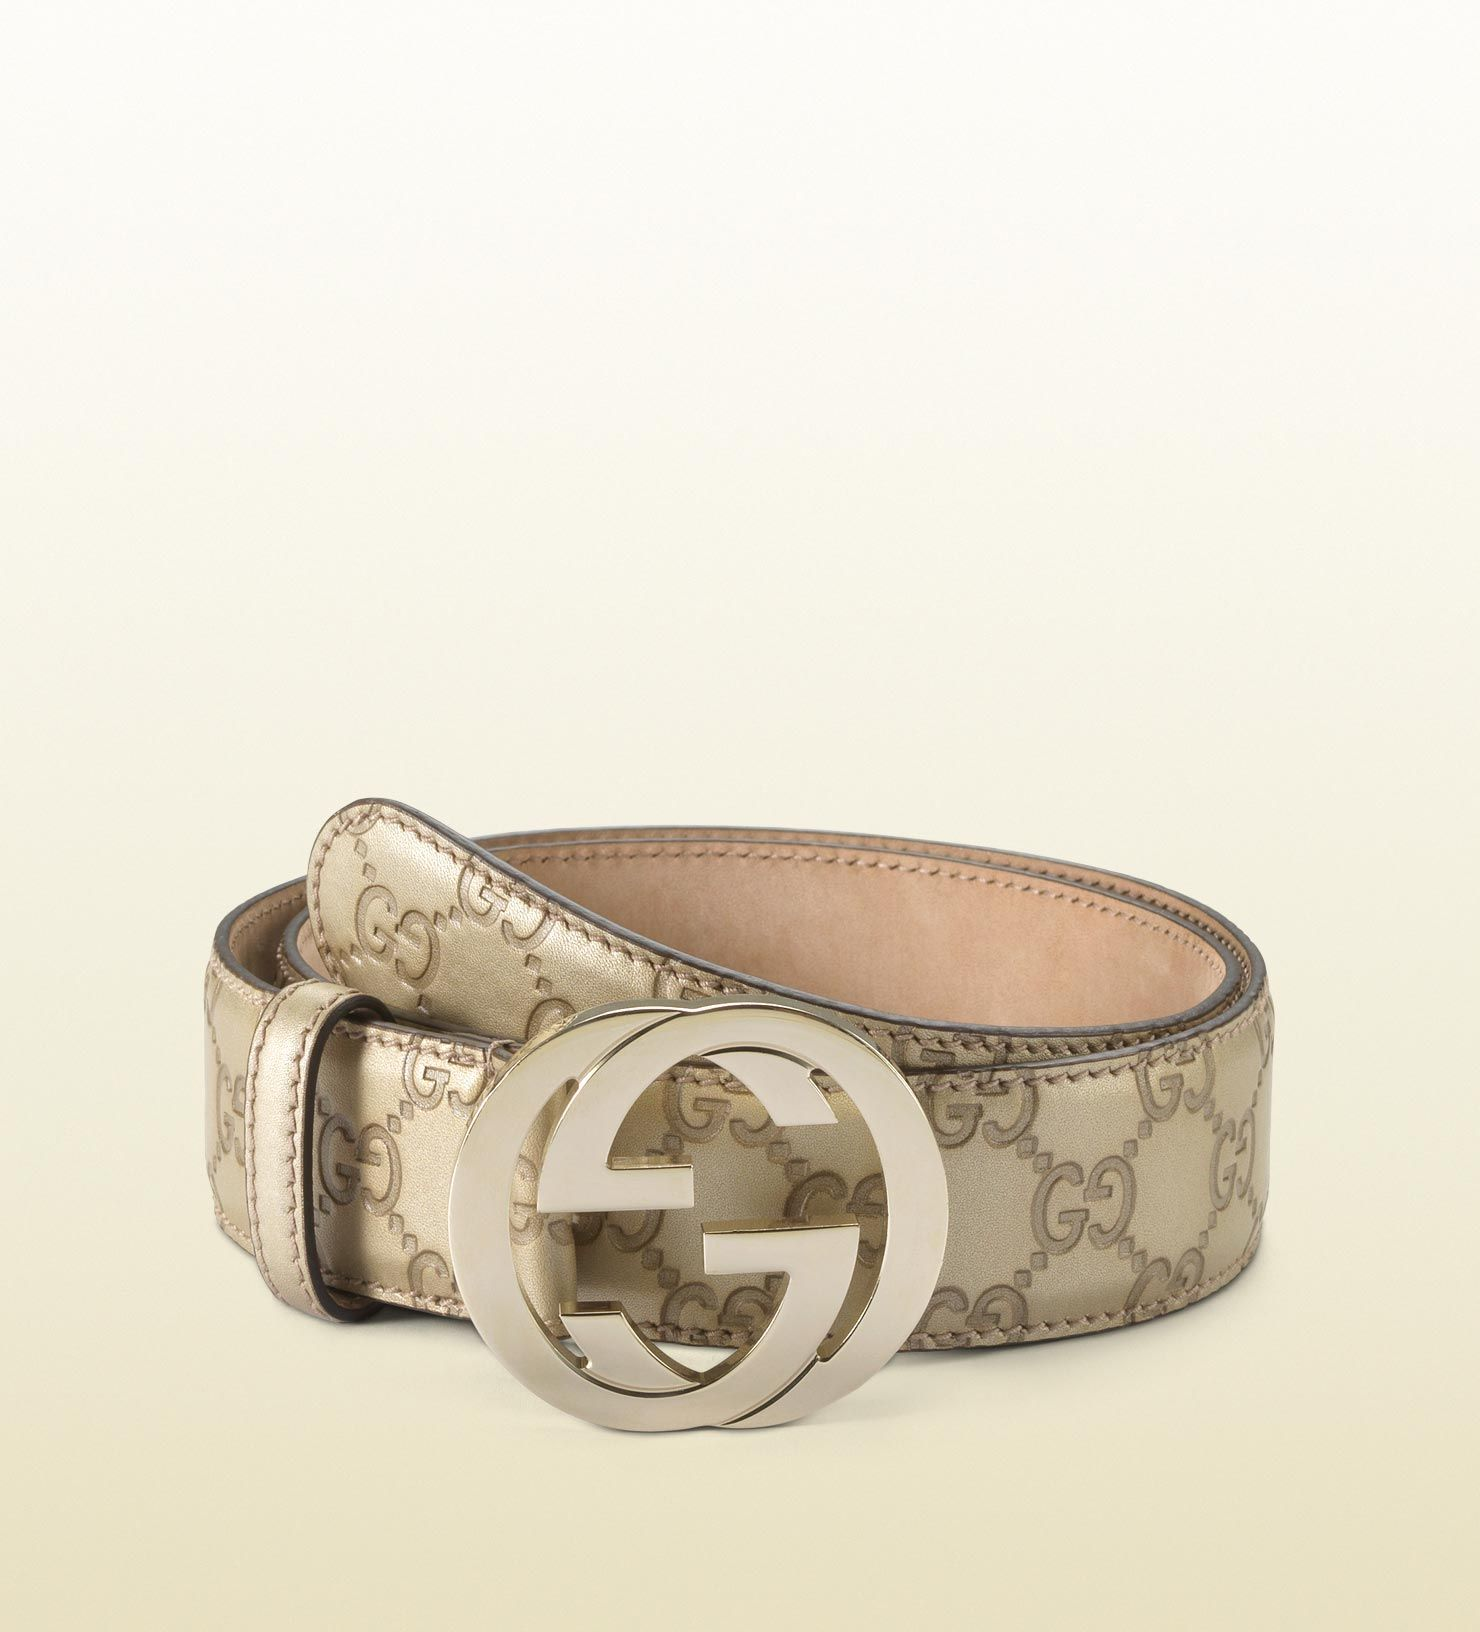 cba3e494e metallic leather belt with interlocking G buckle   Leather goods ...